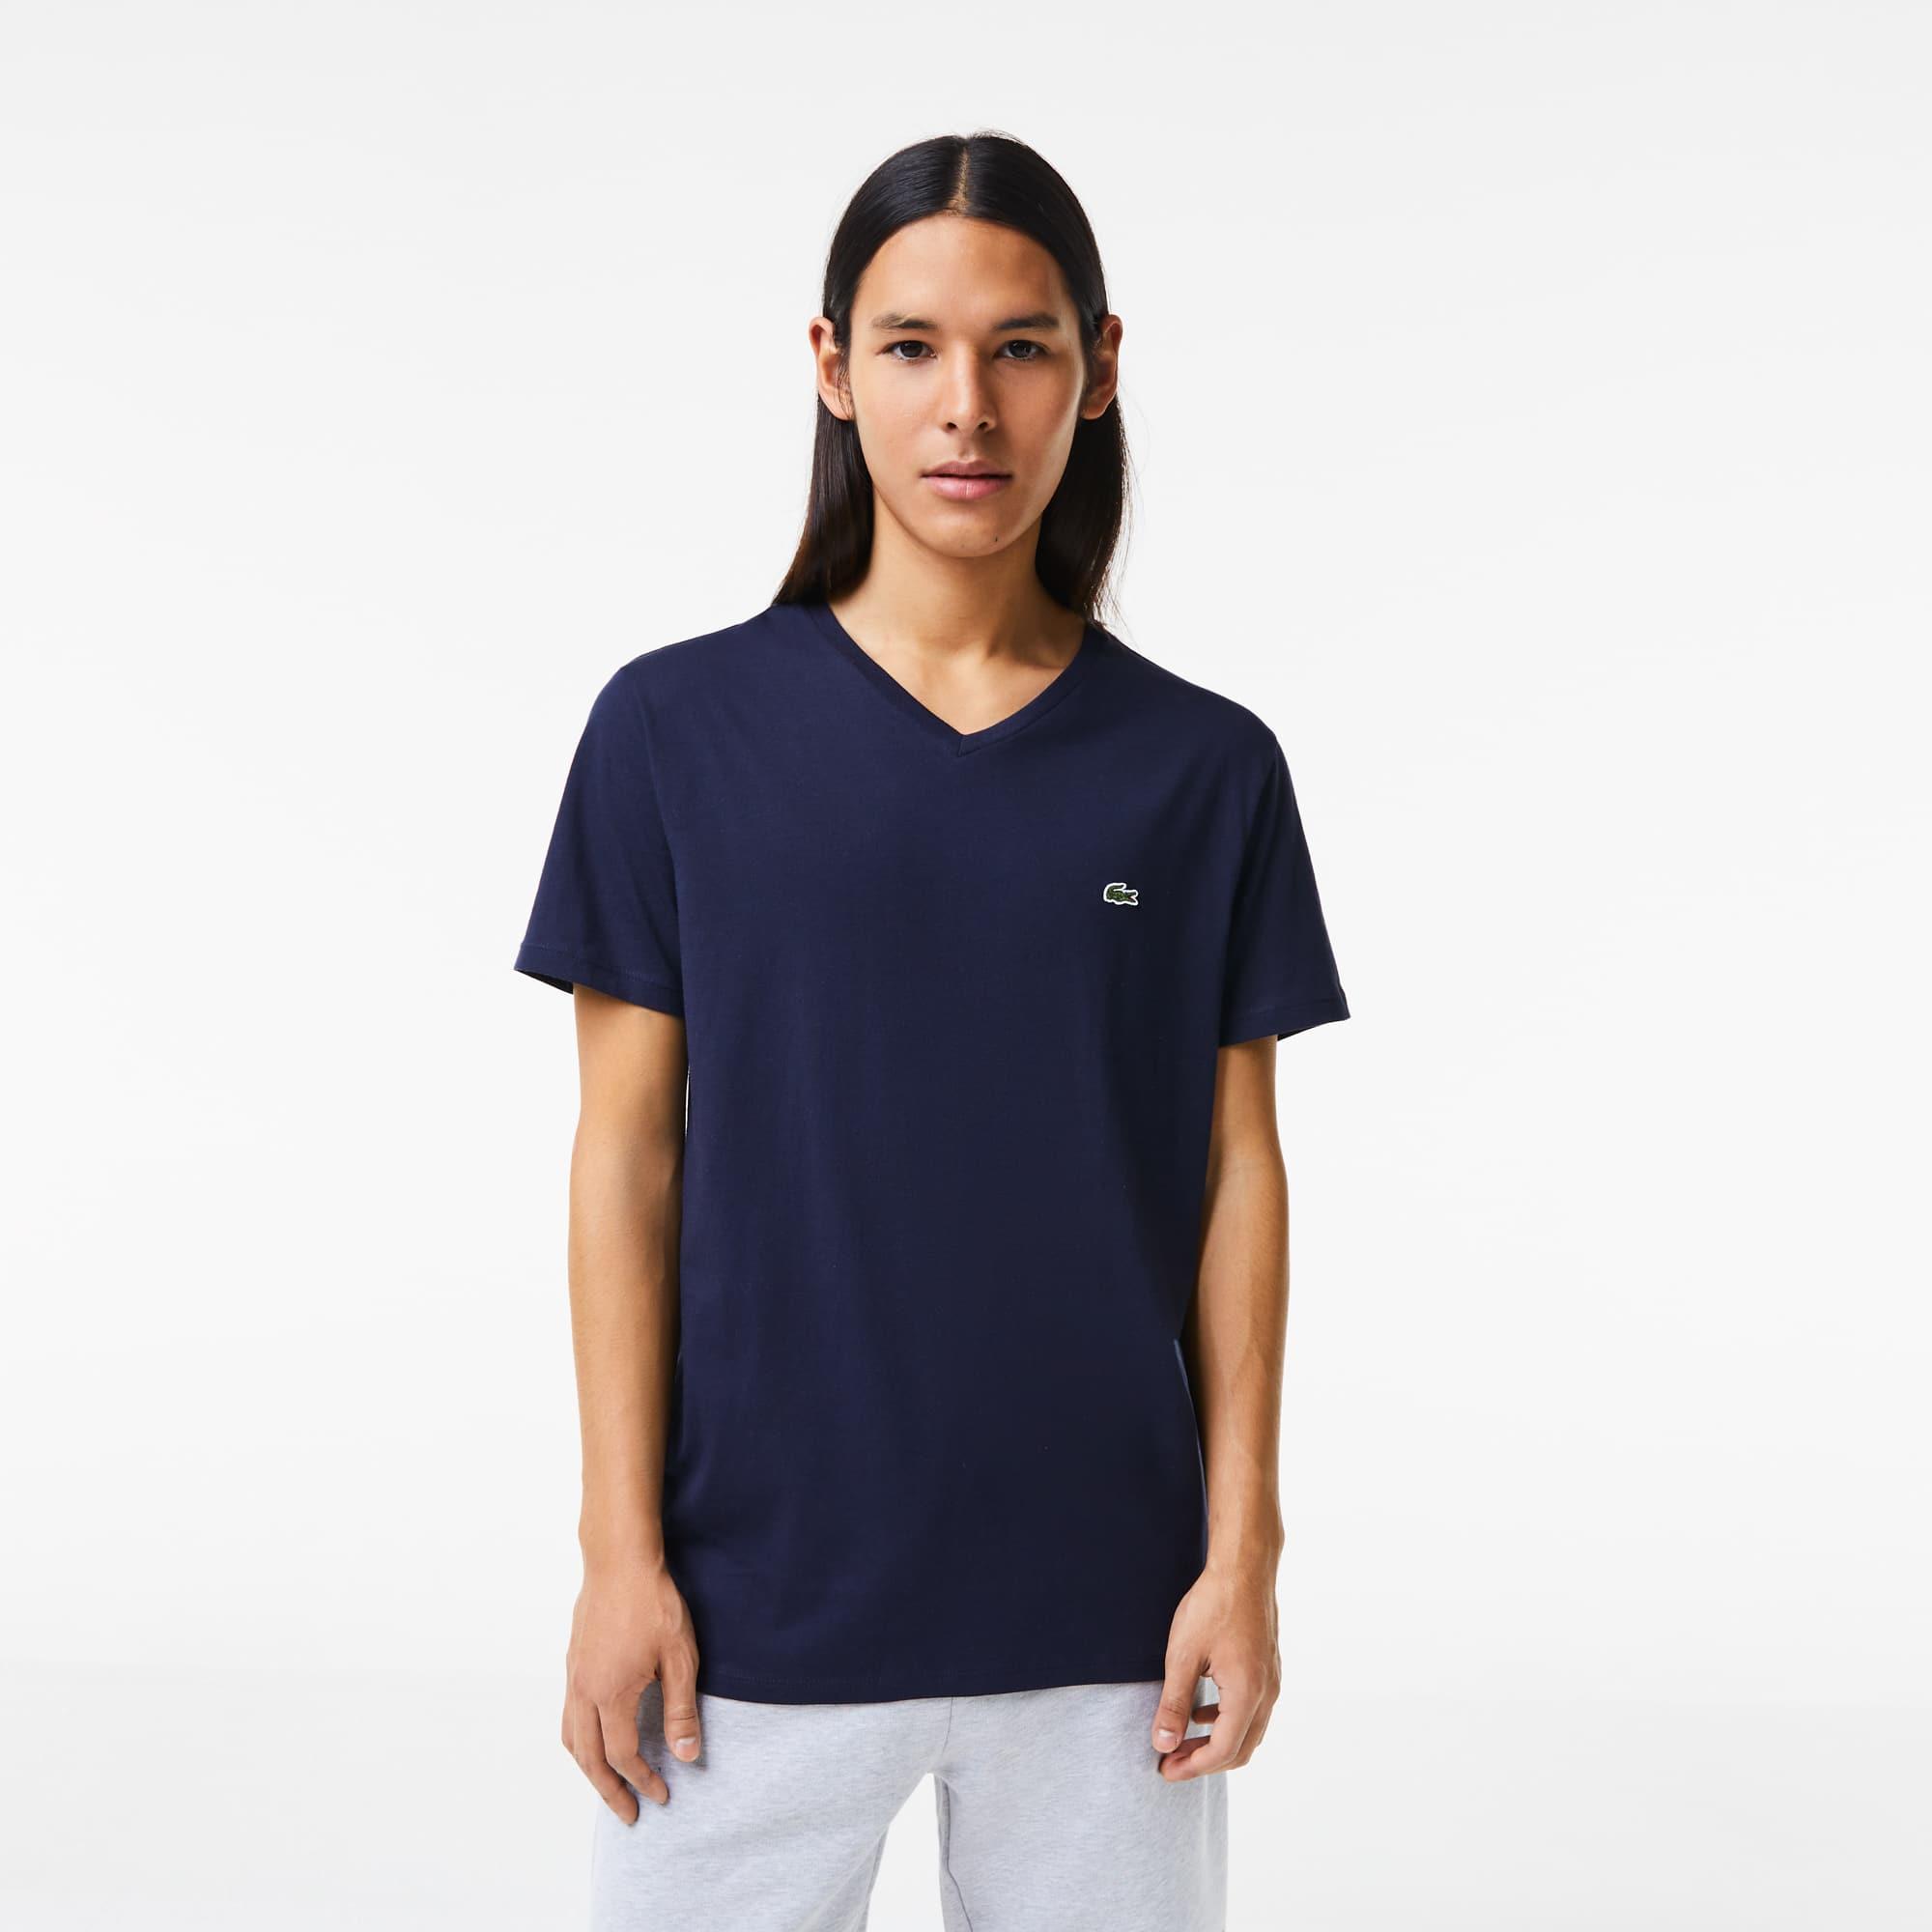 Lacoste Pima Cotton V Neck T Shirt # TH6604 51 166 Navy Men SZ S 3XL